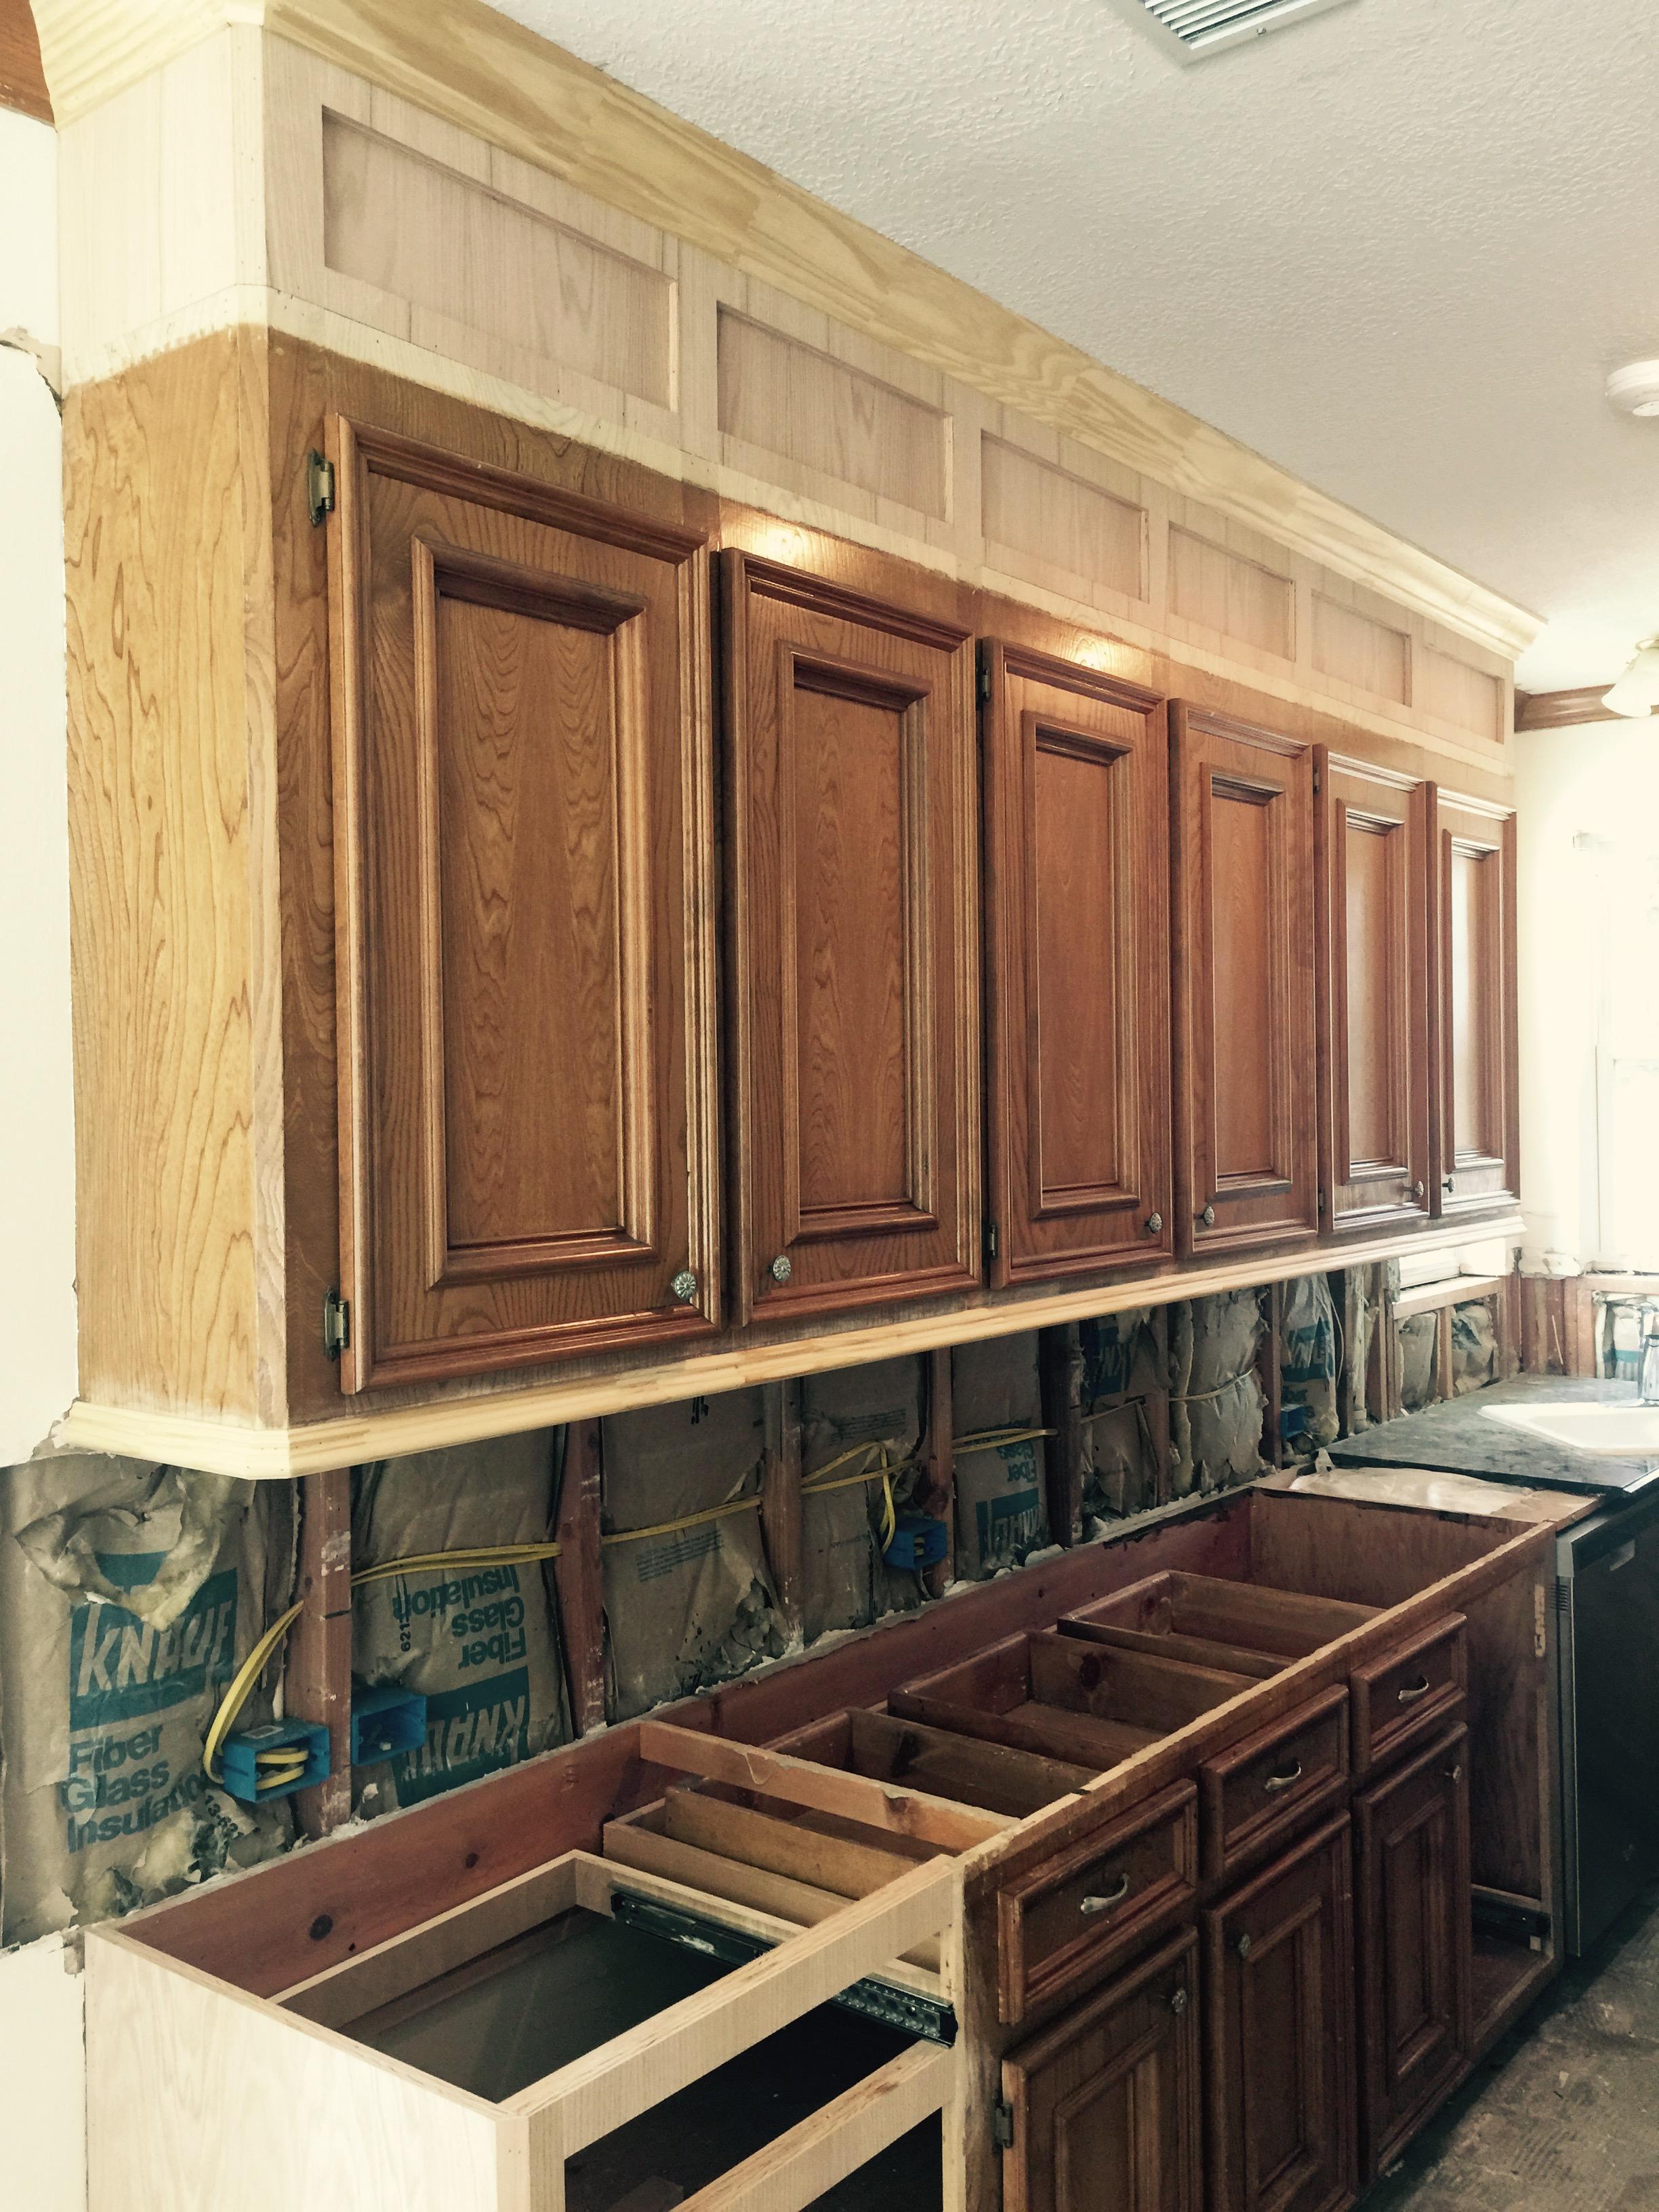 & Soffit Above Kitchen Cabinets Ideas